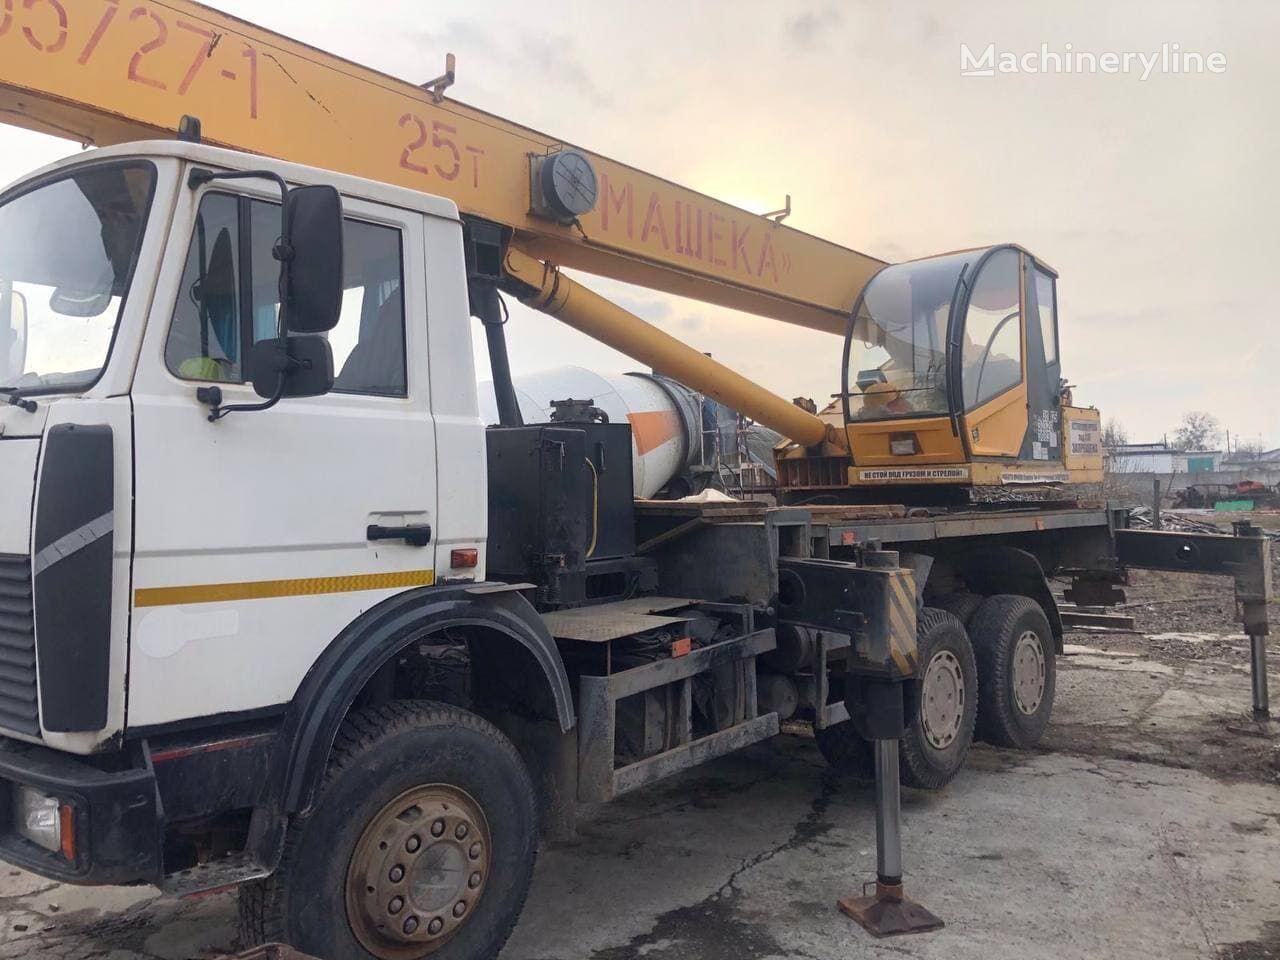 KS 55727 on chassis MAZ 630303 mobile crane